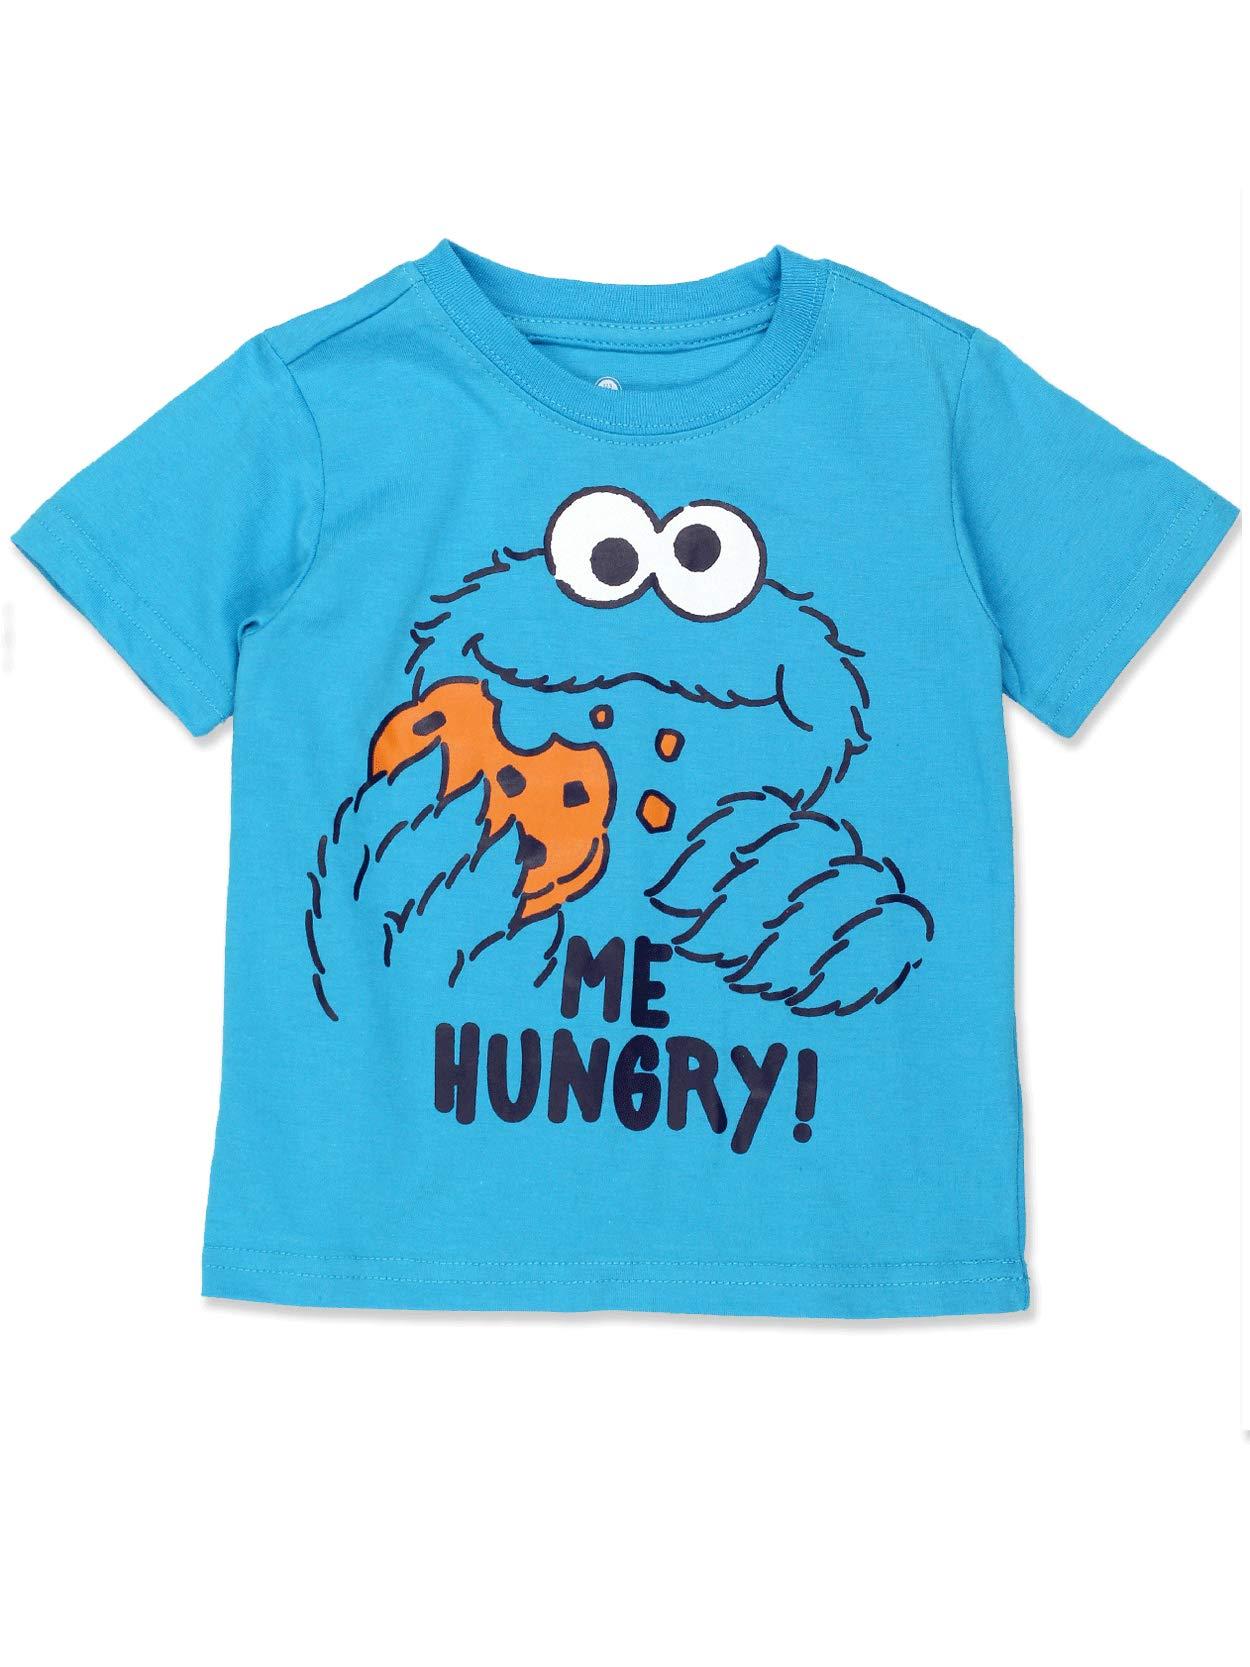 Sesame Street Cookie Monster Baby Toddler Boys Short Sleeve Tee (2T, Blue) by Sesame Street